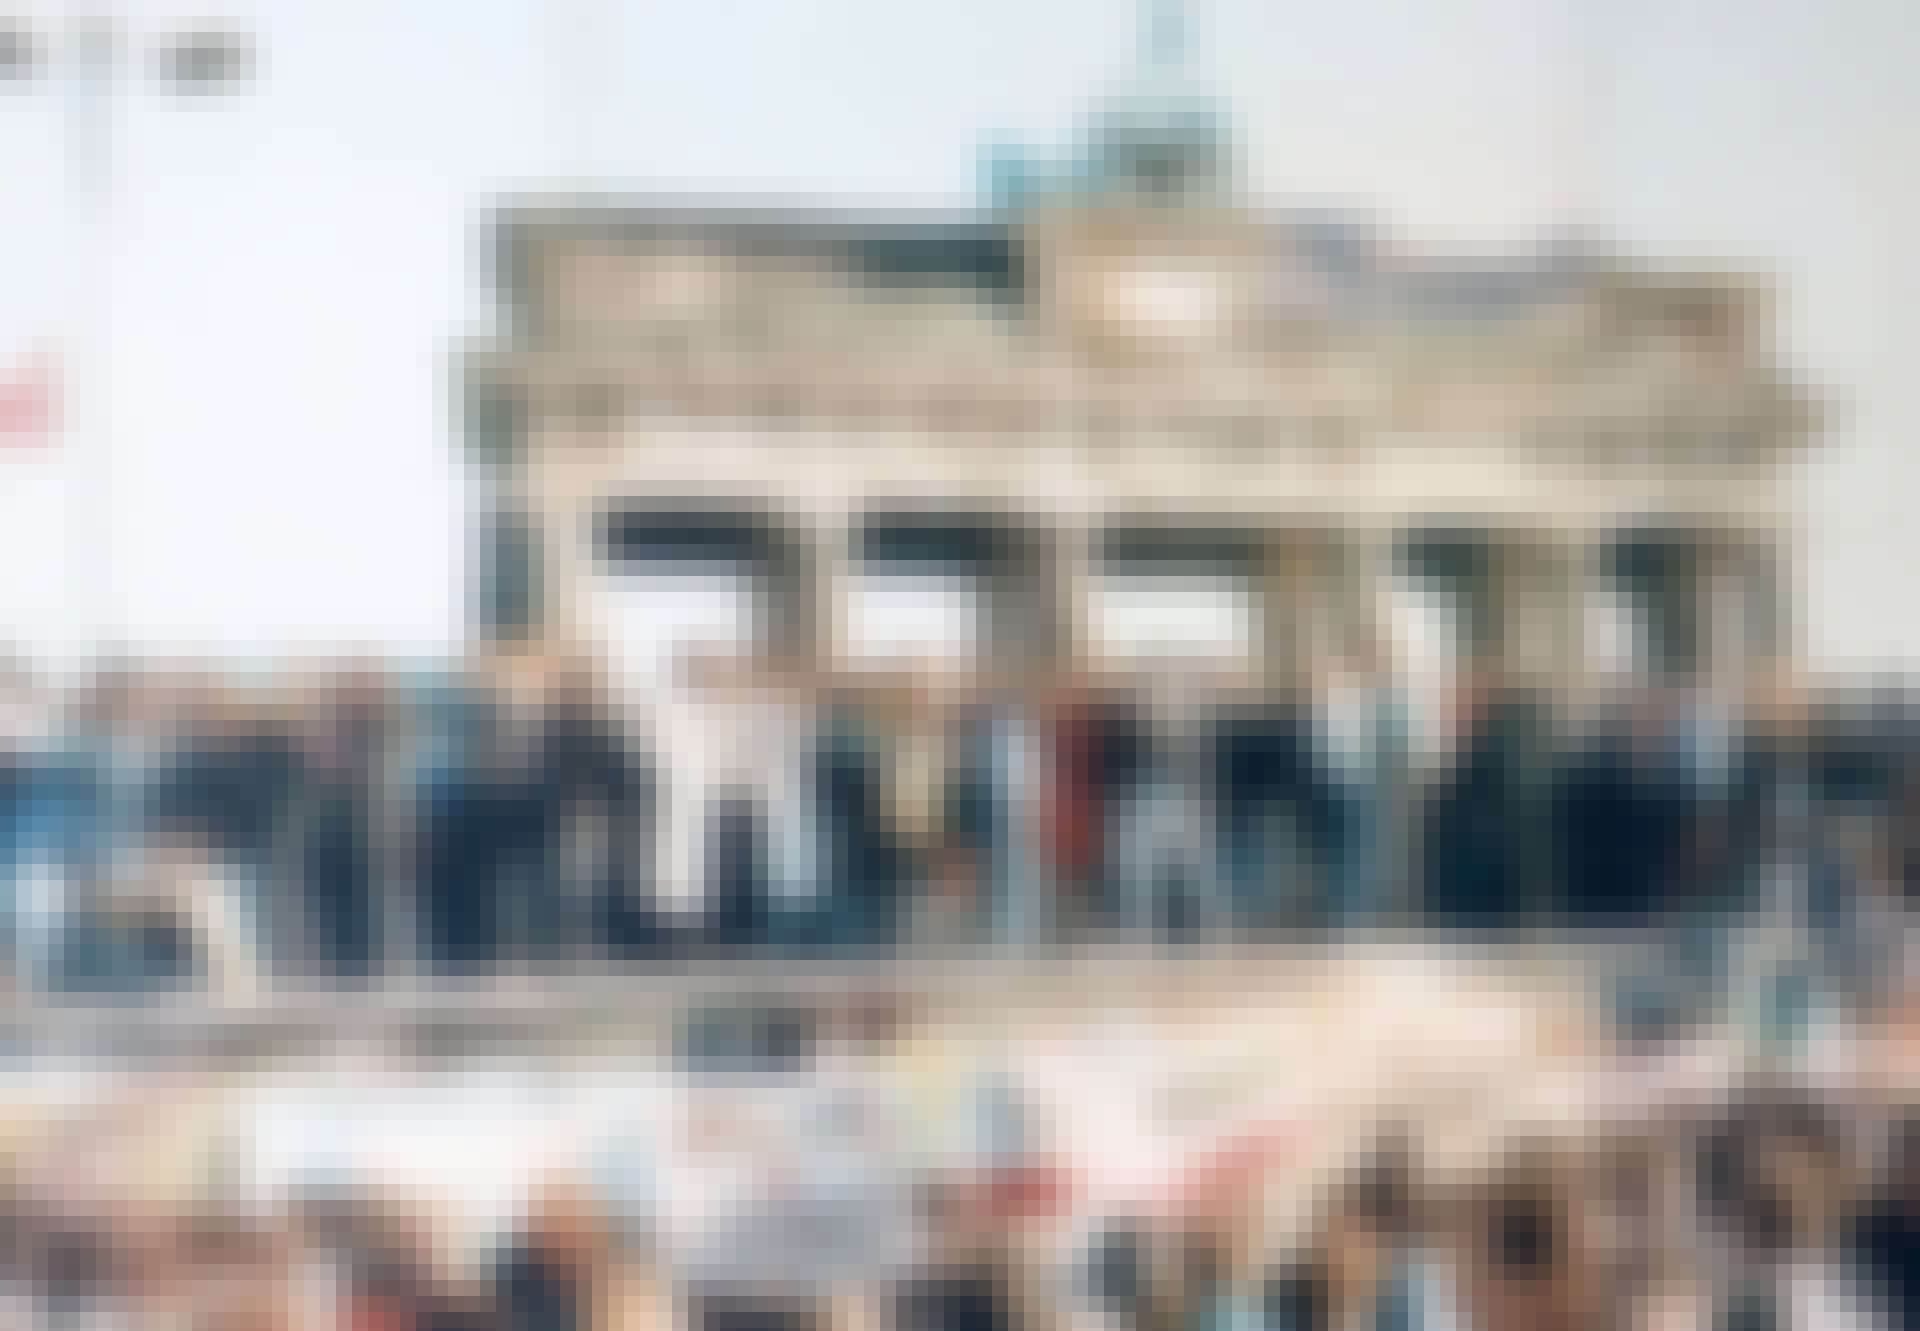 Berlinmuren For Under Og Efter Murens Fald Historienet Dk